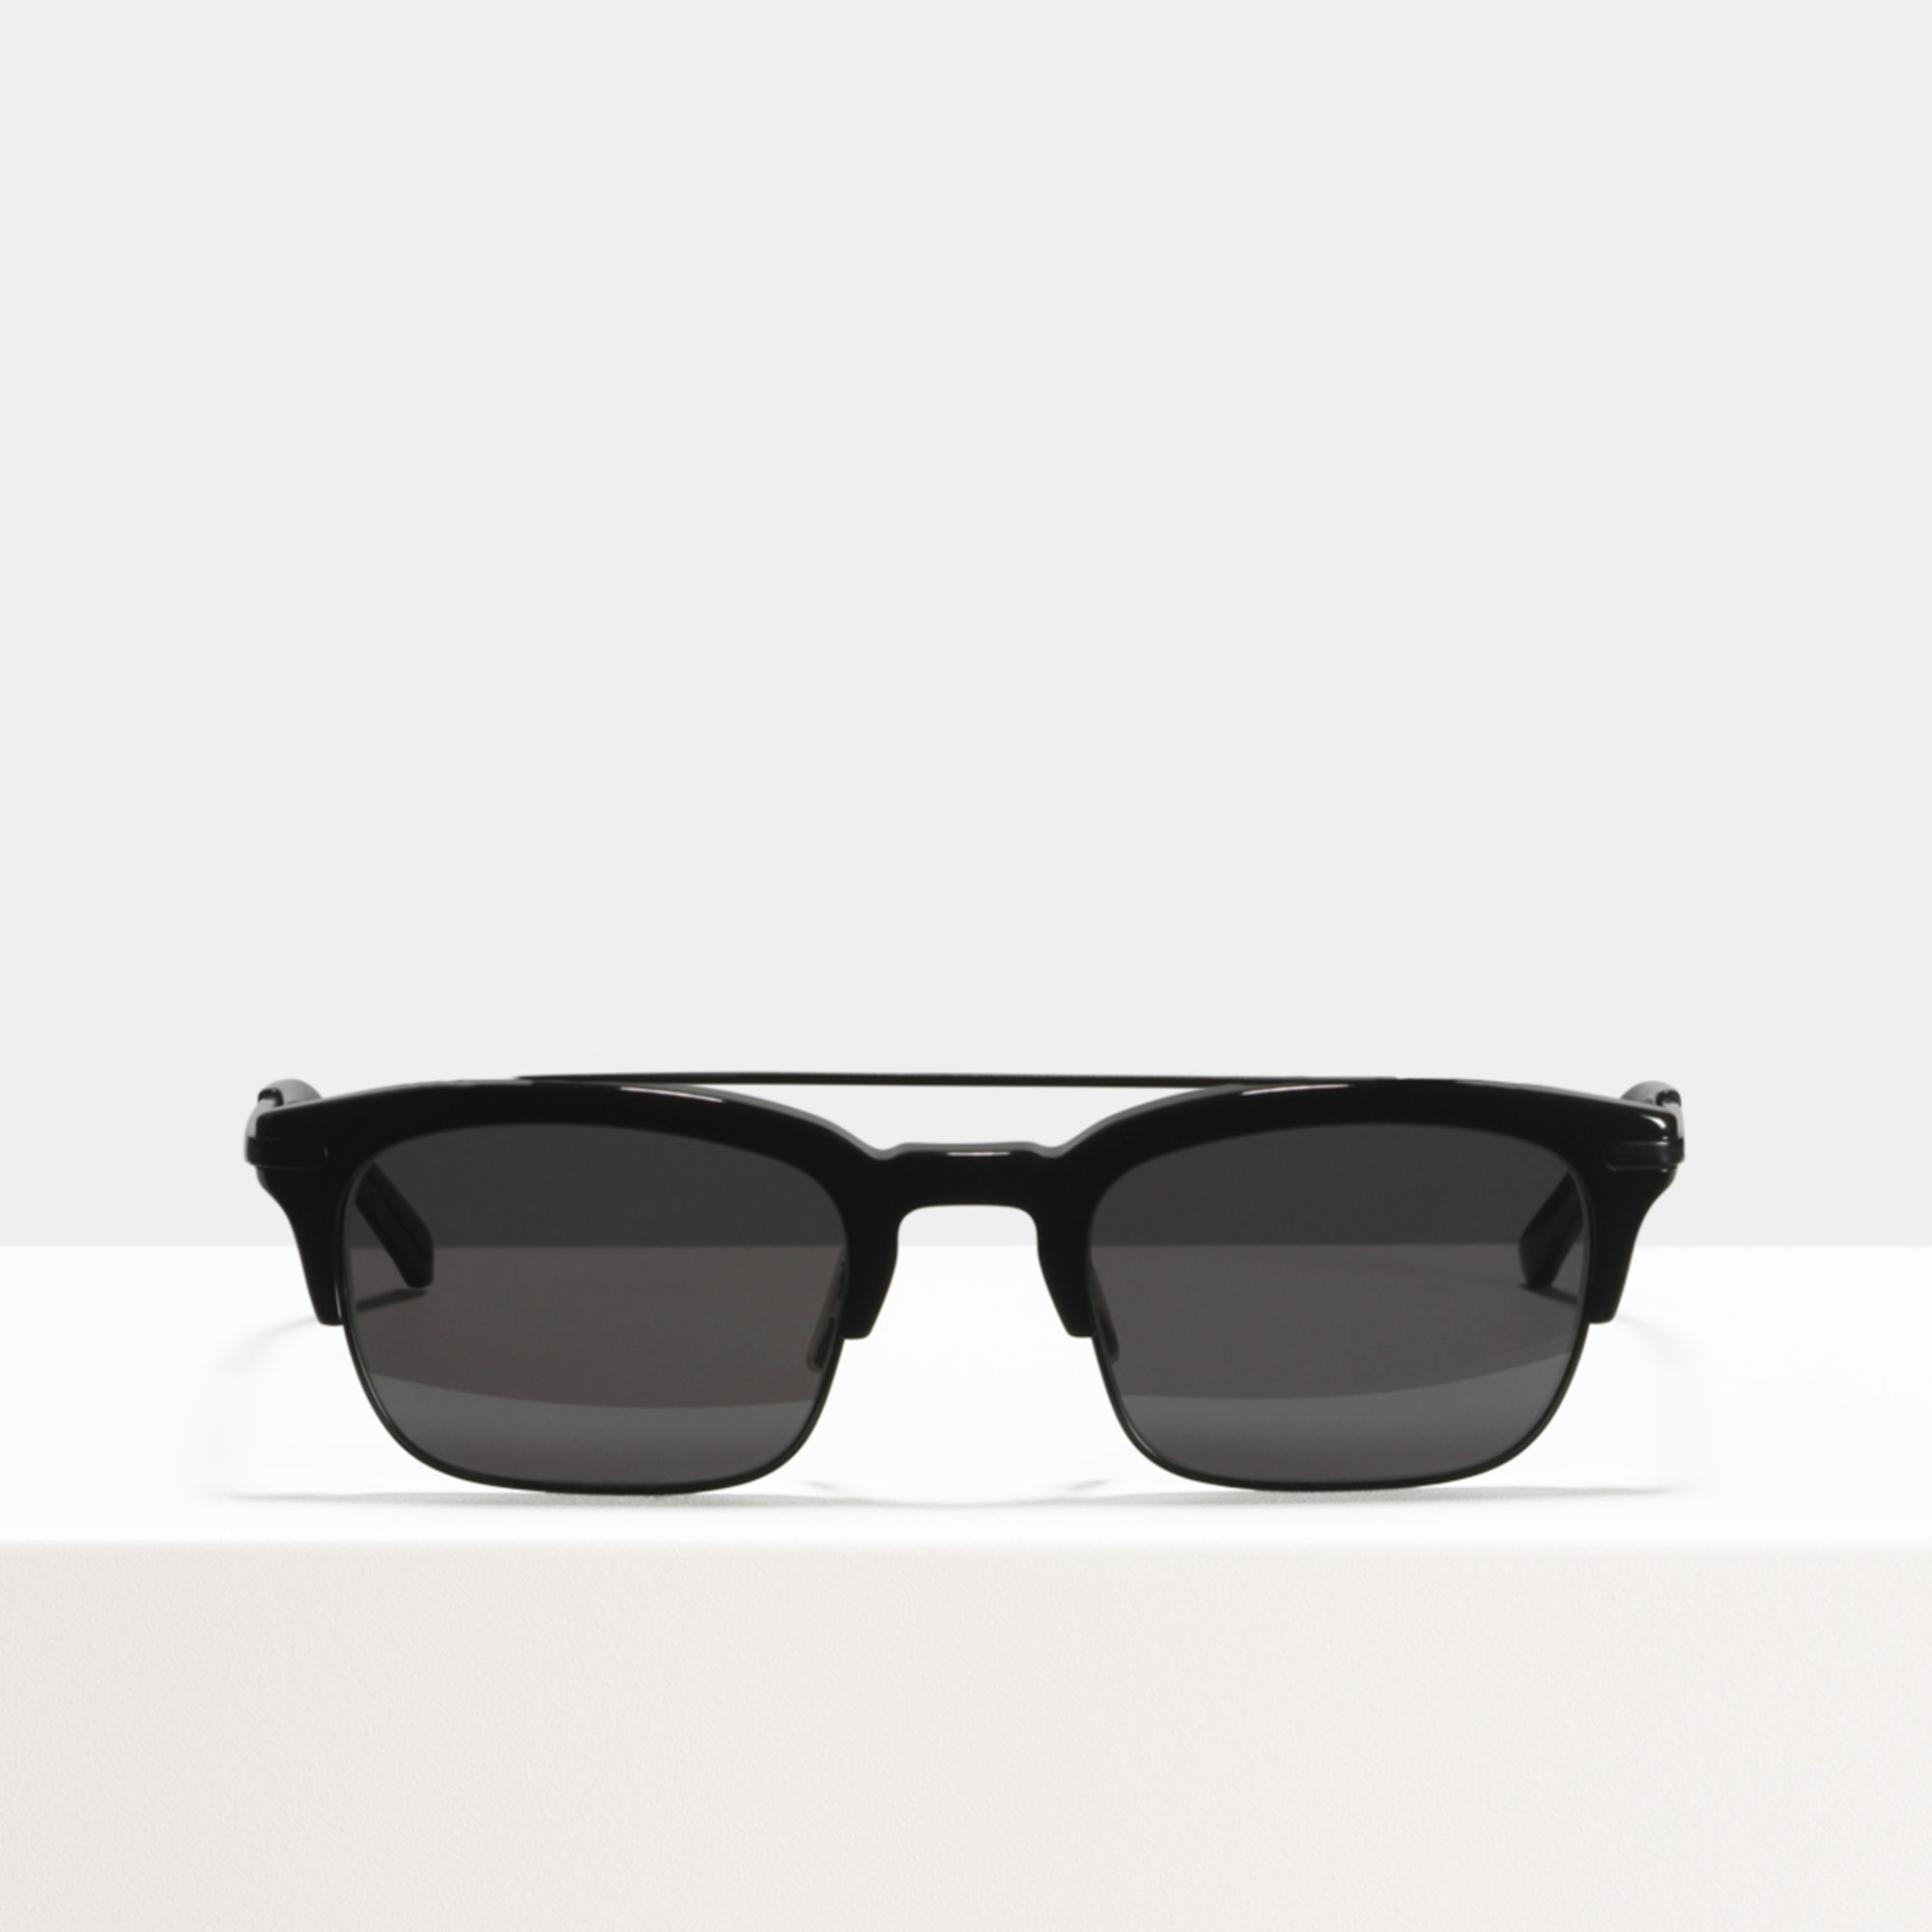 Ace & Tate Sunglasses | rectangle acetate in Black